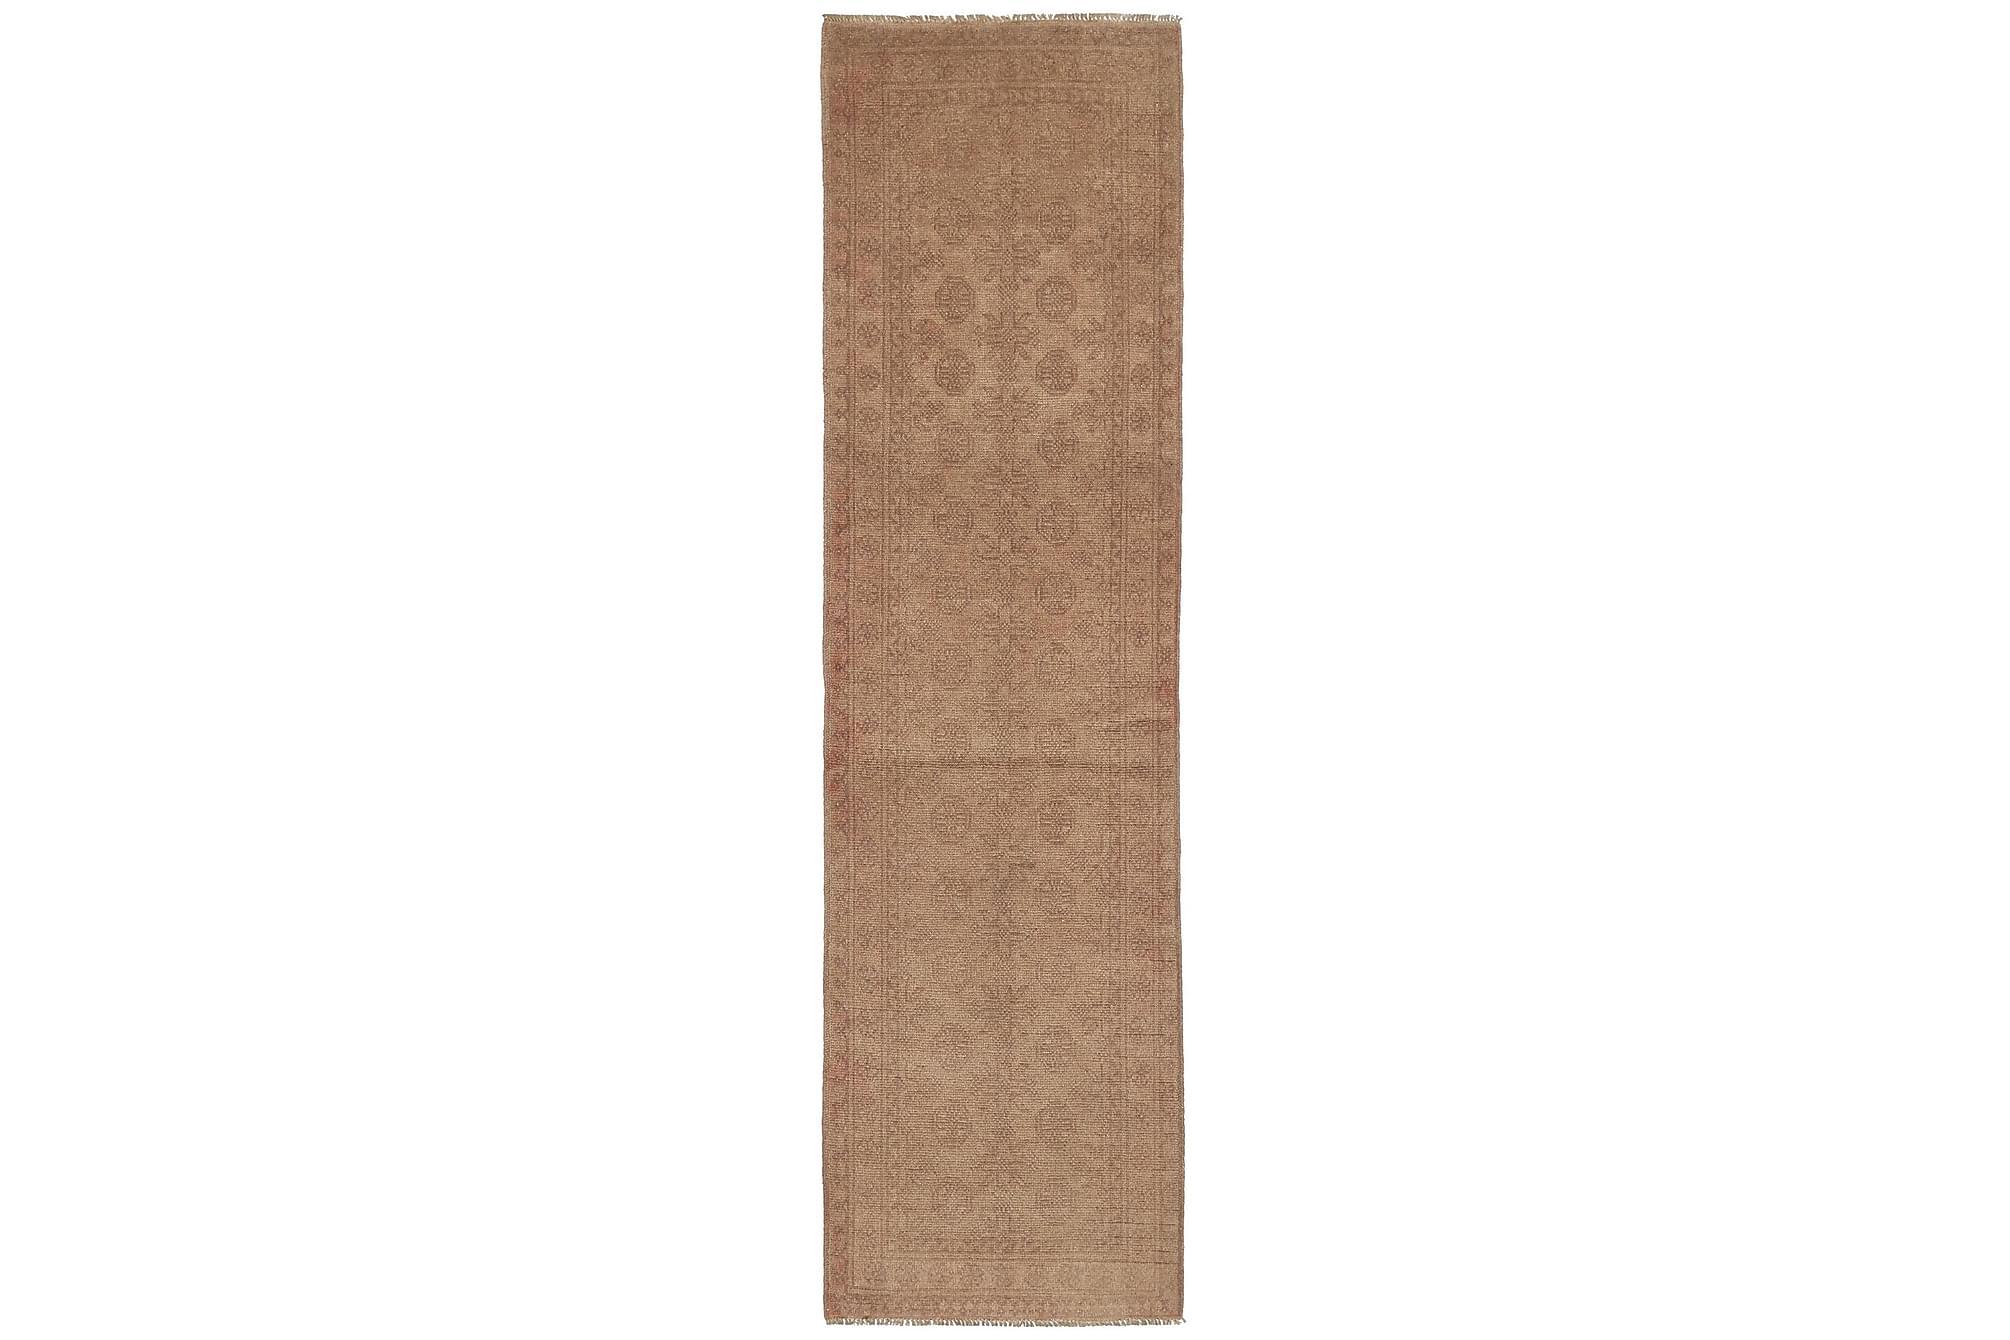 AFGHAN Matta 74x283 Stor Beige/Brun, Orientaliska mattor